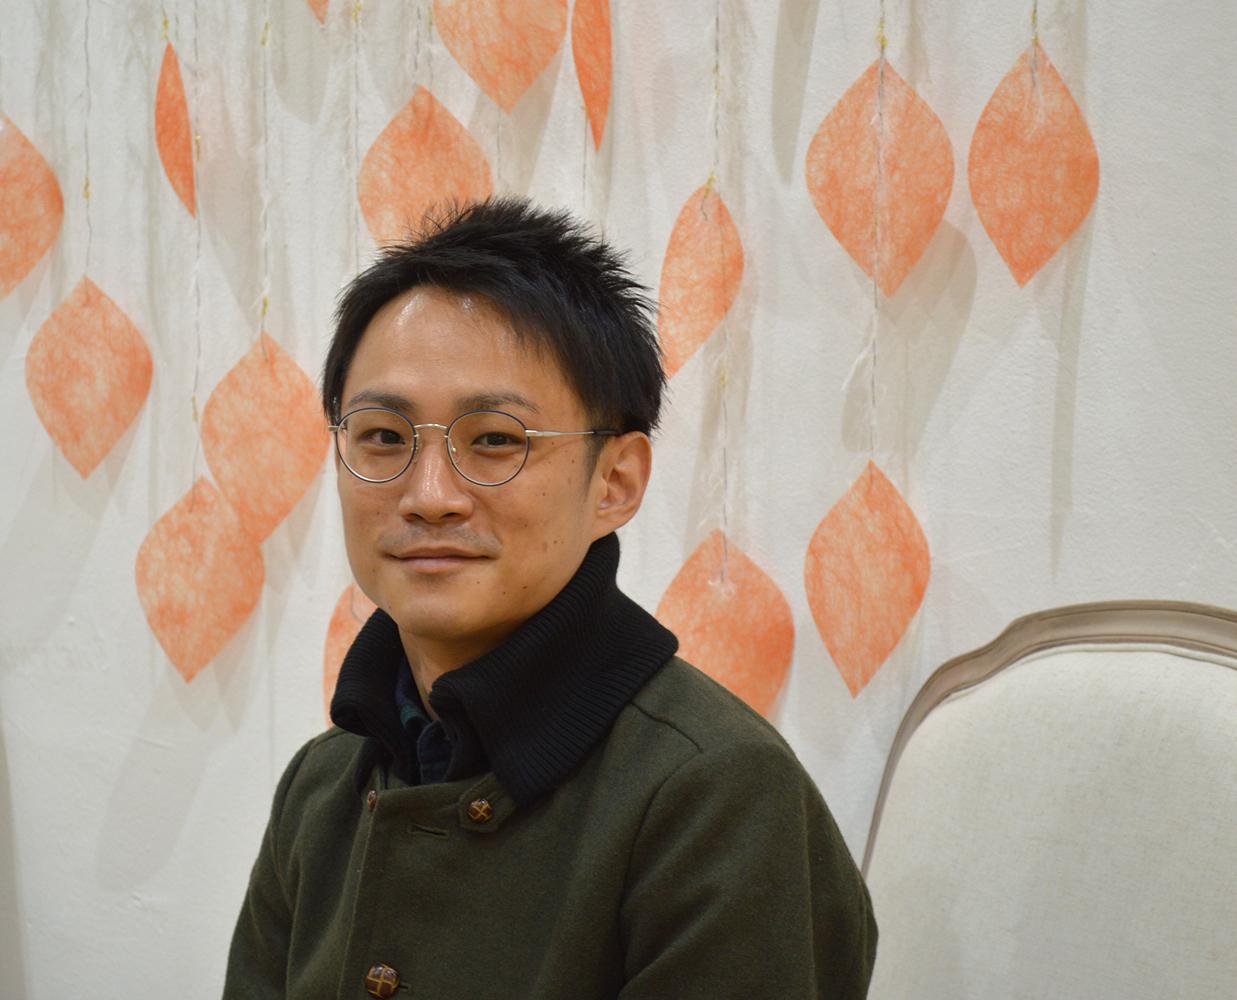 wearing with KIO YAMATO